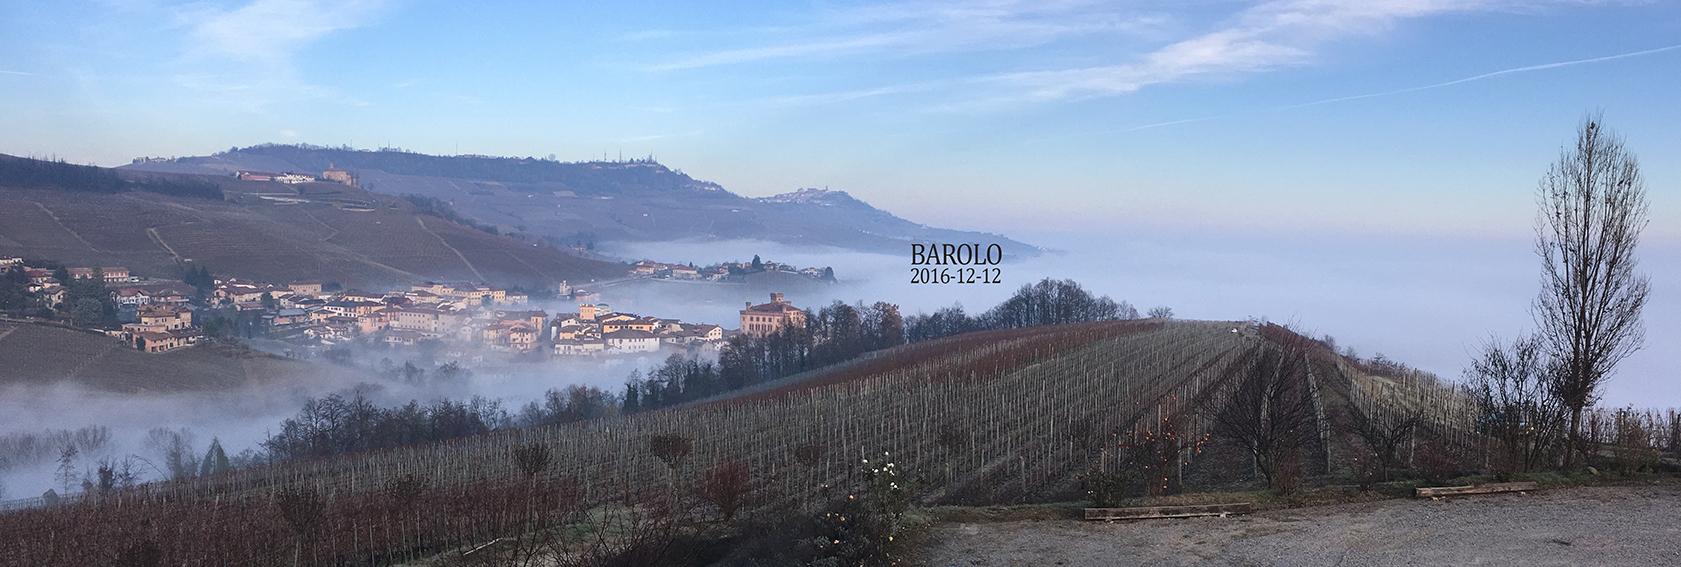 2016-12-12-fog-in-barolo